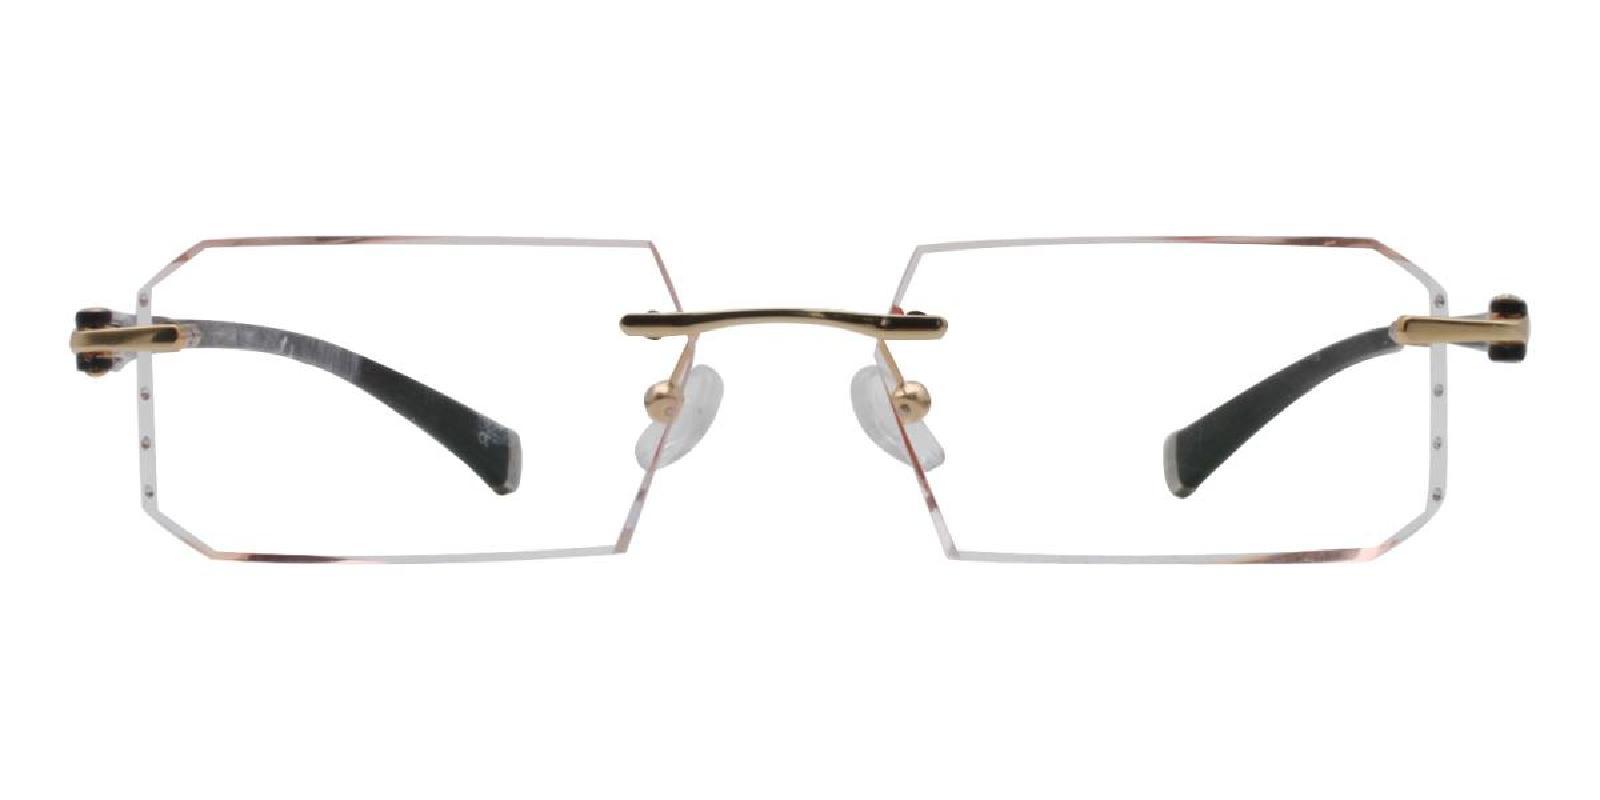 Pandoco-Gold-Varieties-Titanium-Eyeglasses-additional2